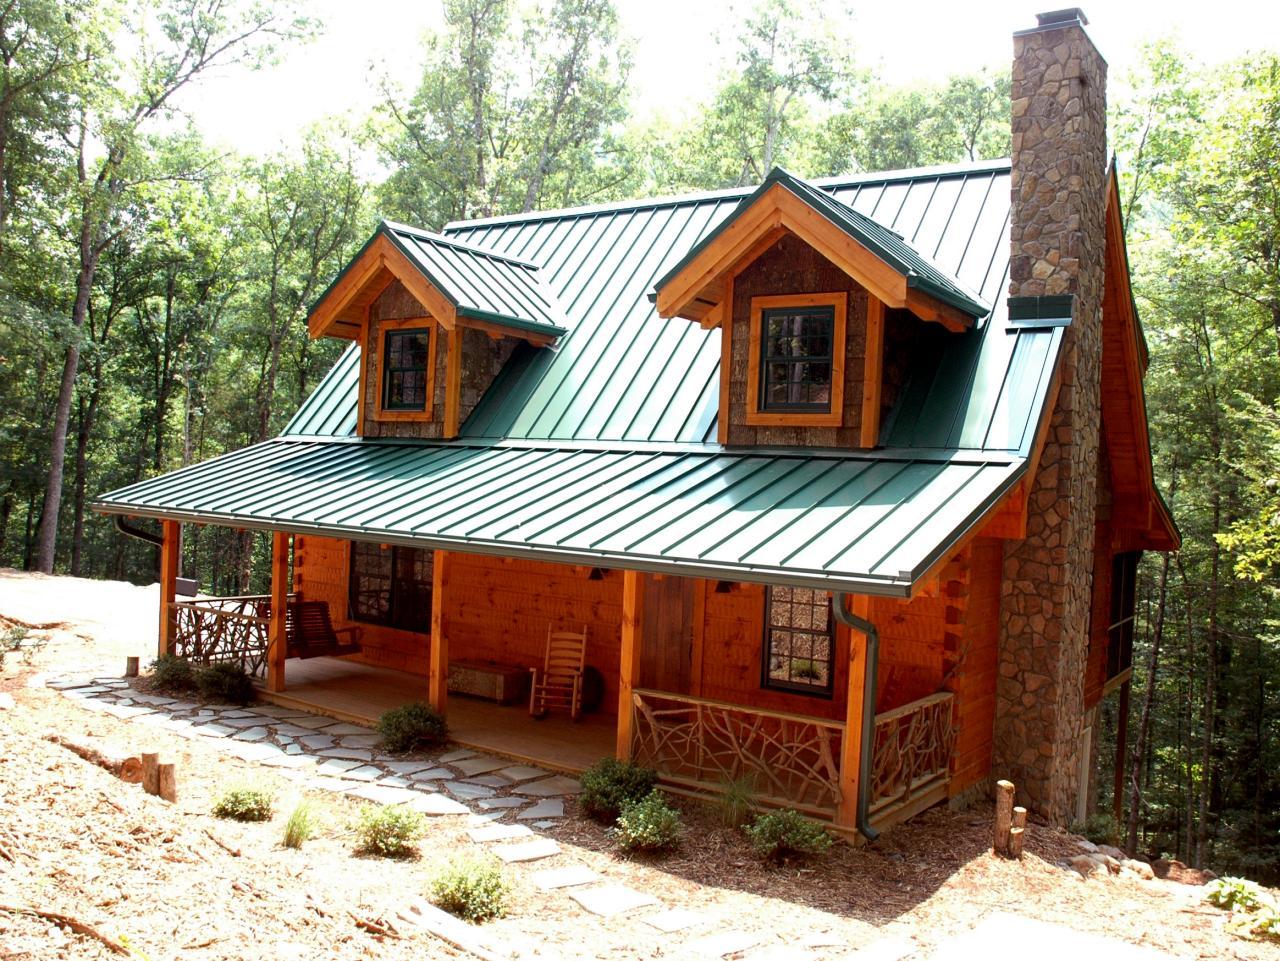 Blog Cabin Charming Outdoor Spaces Diy Network Blog